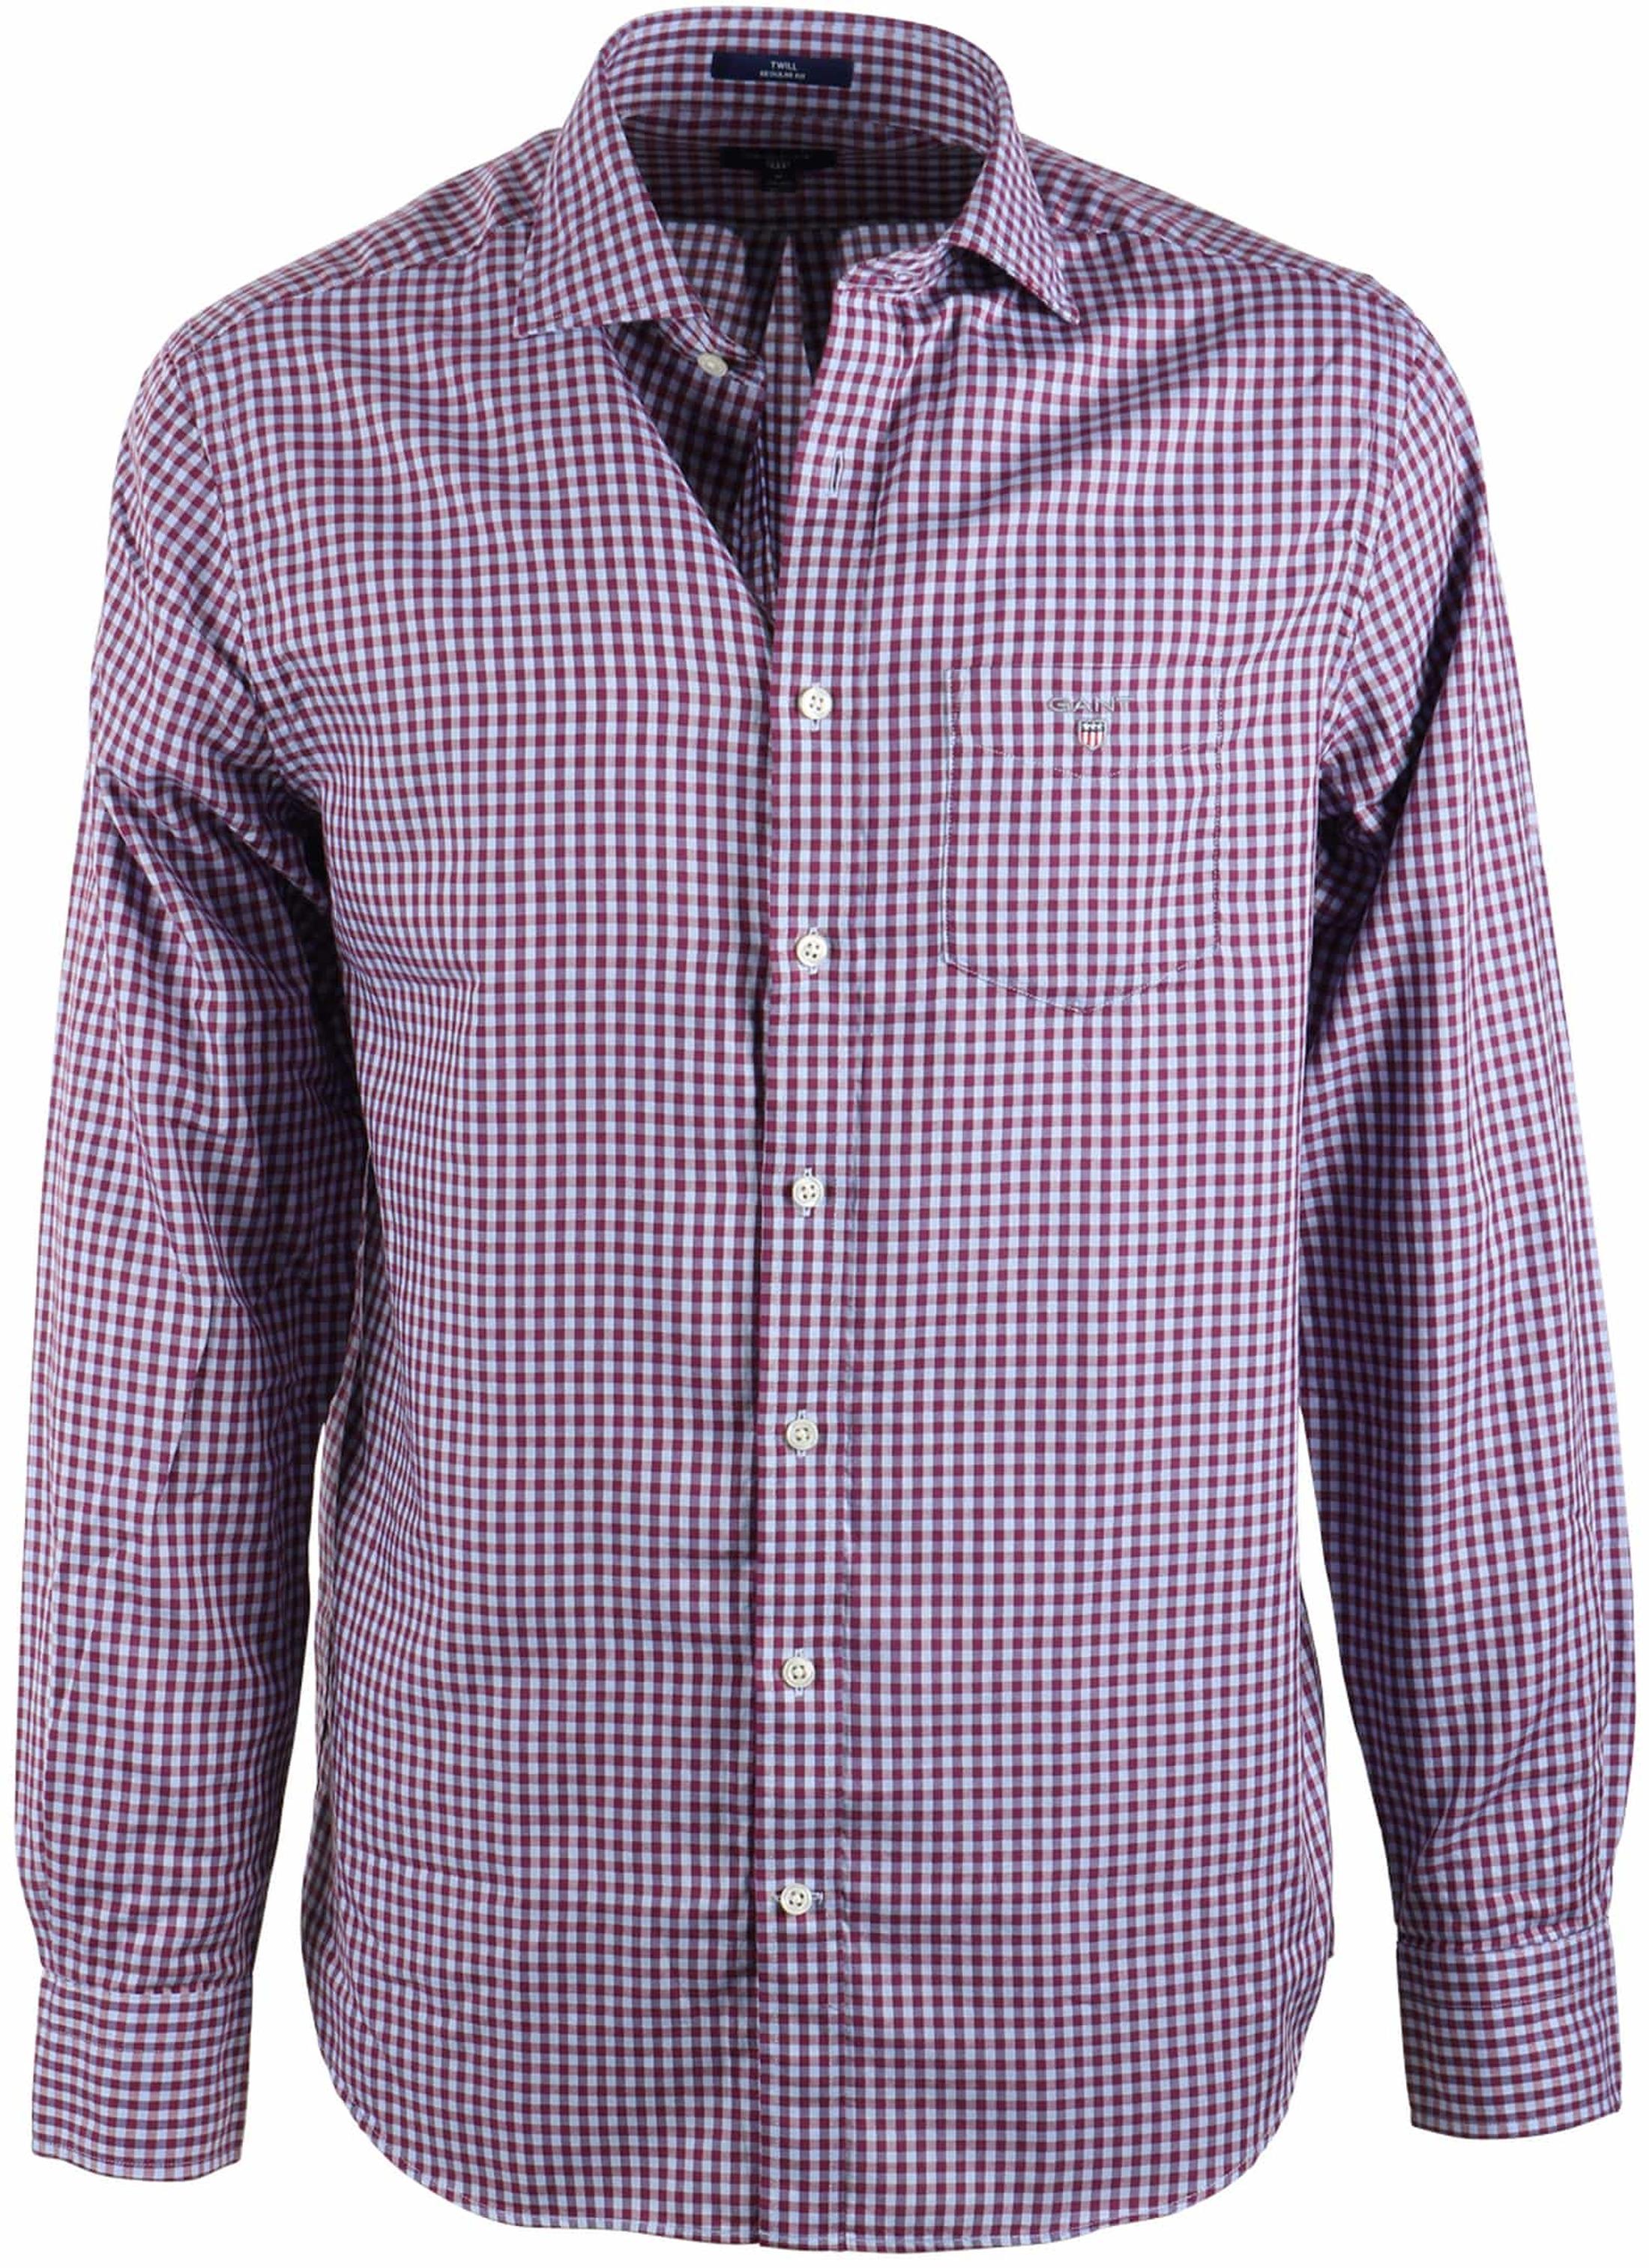 Gant Shirt Bordeaux Blue Checks Foto 0